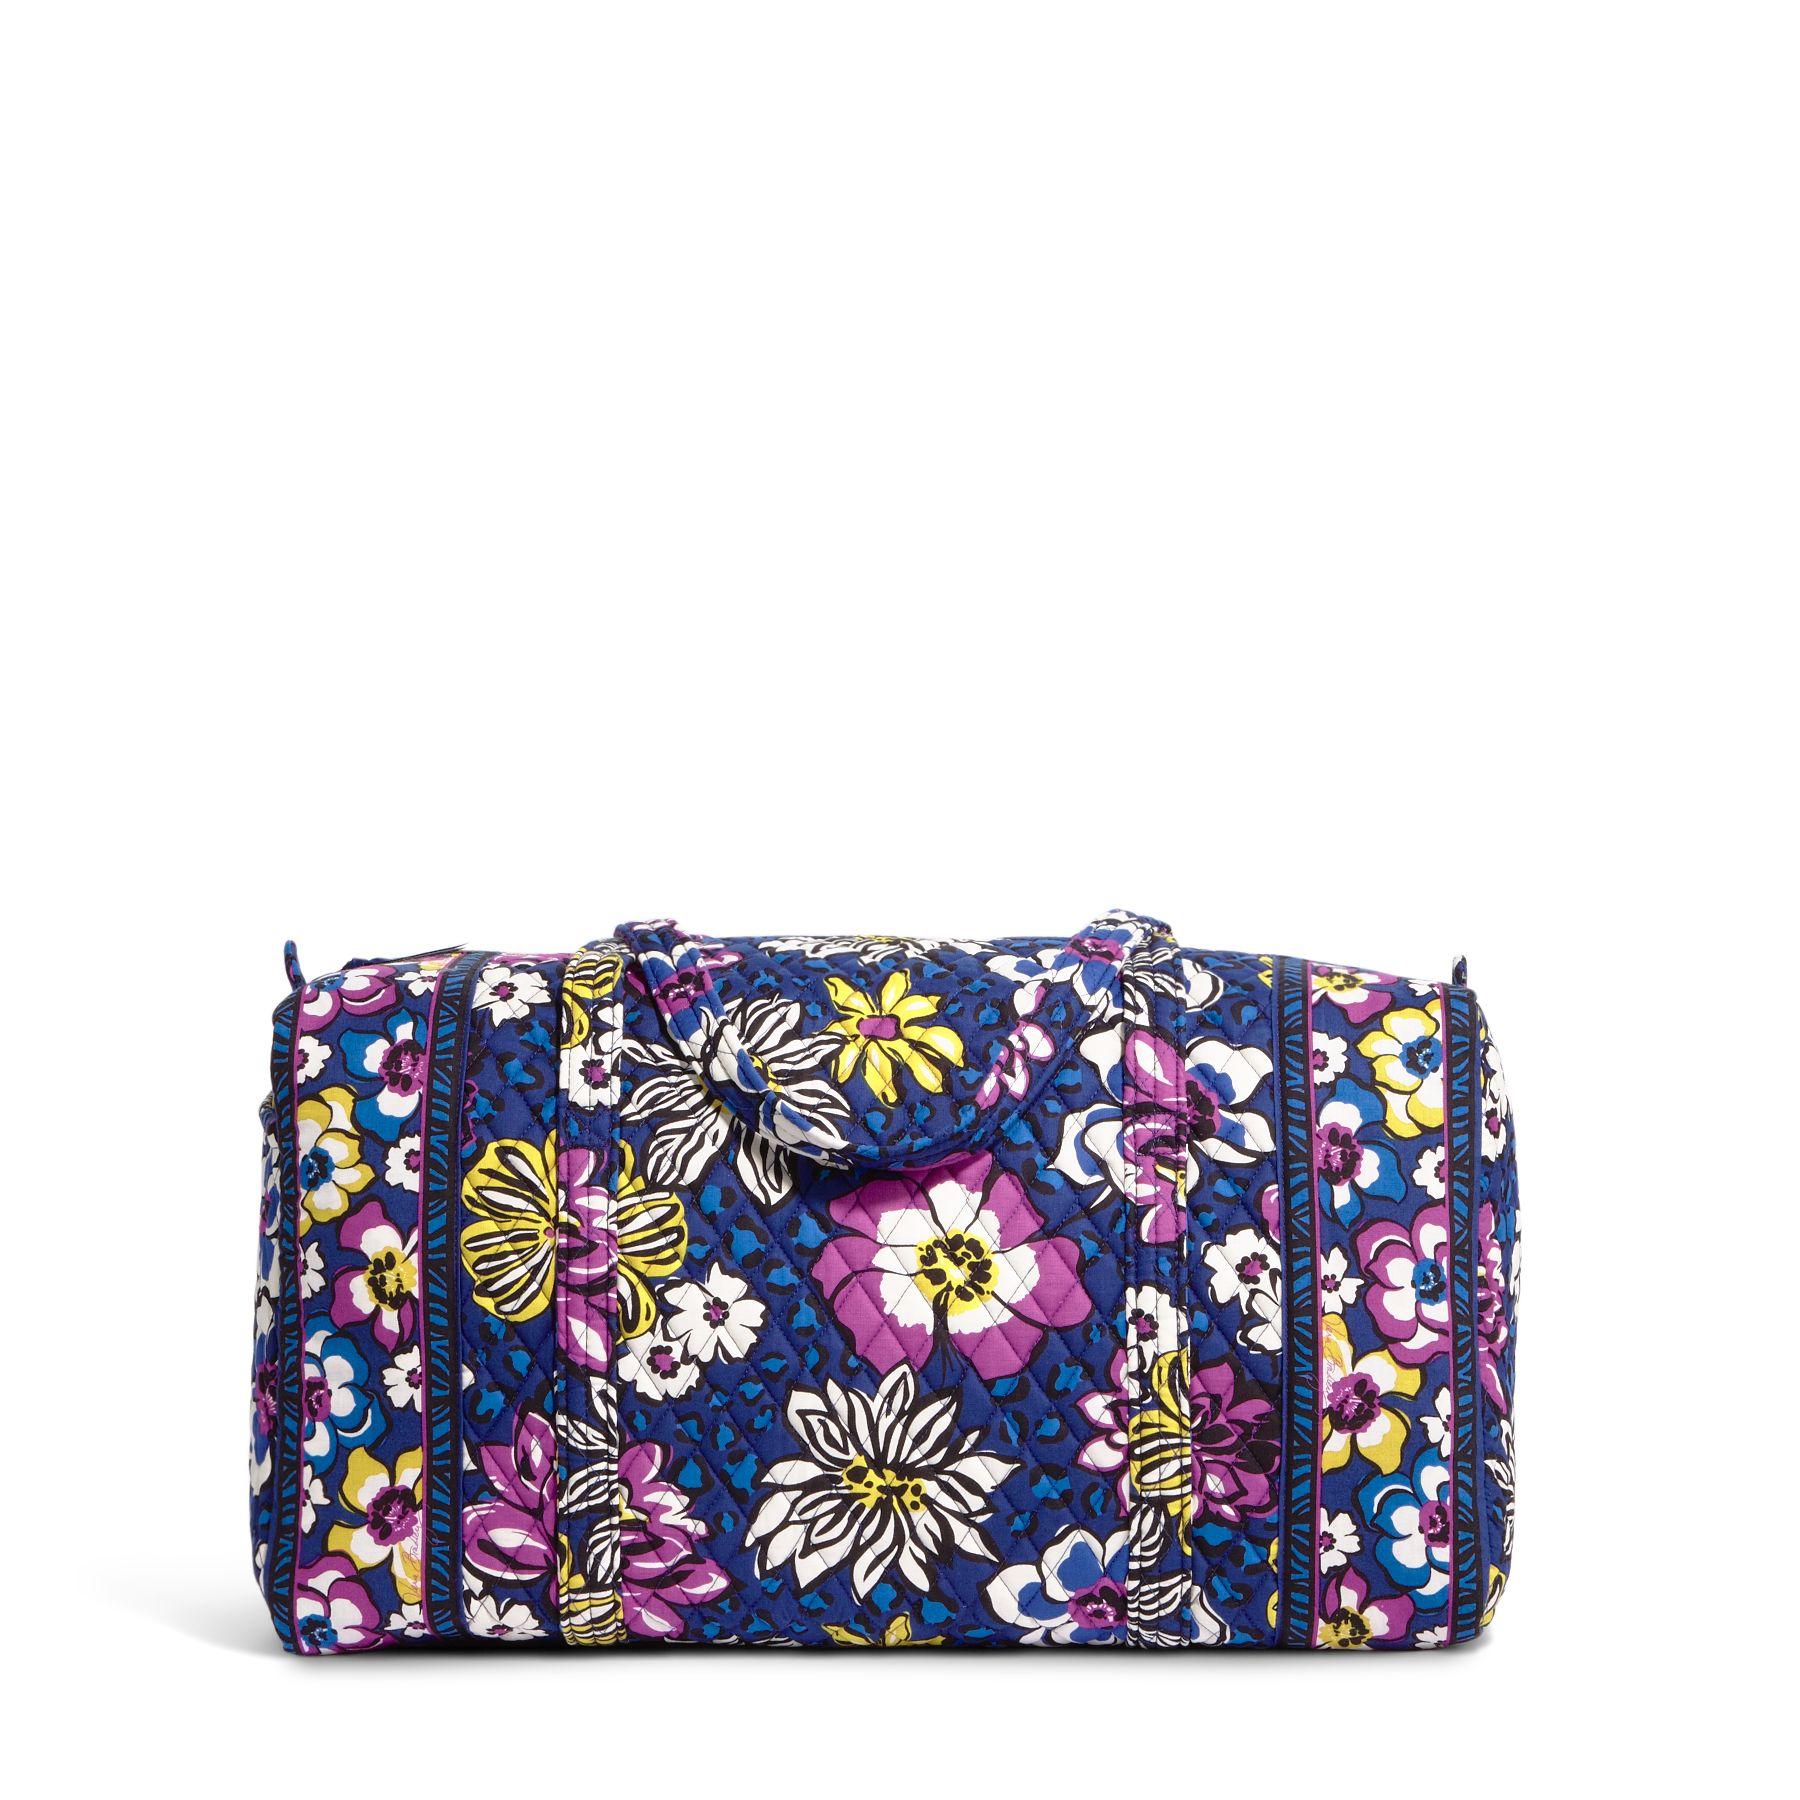 Vera bradley laptop backpack coupon code